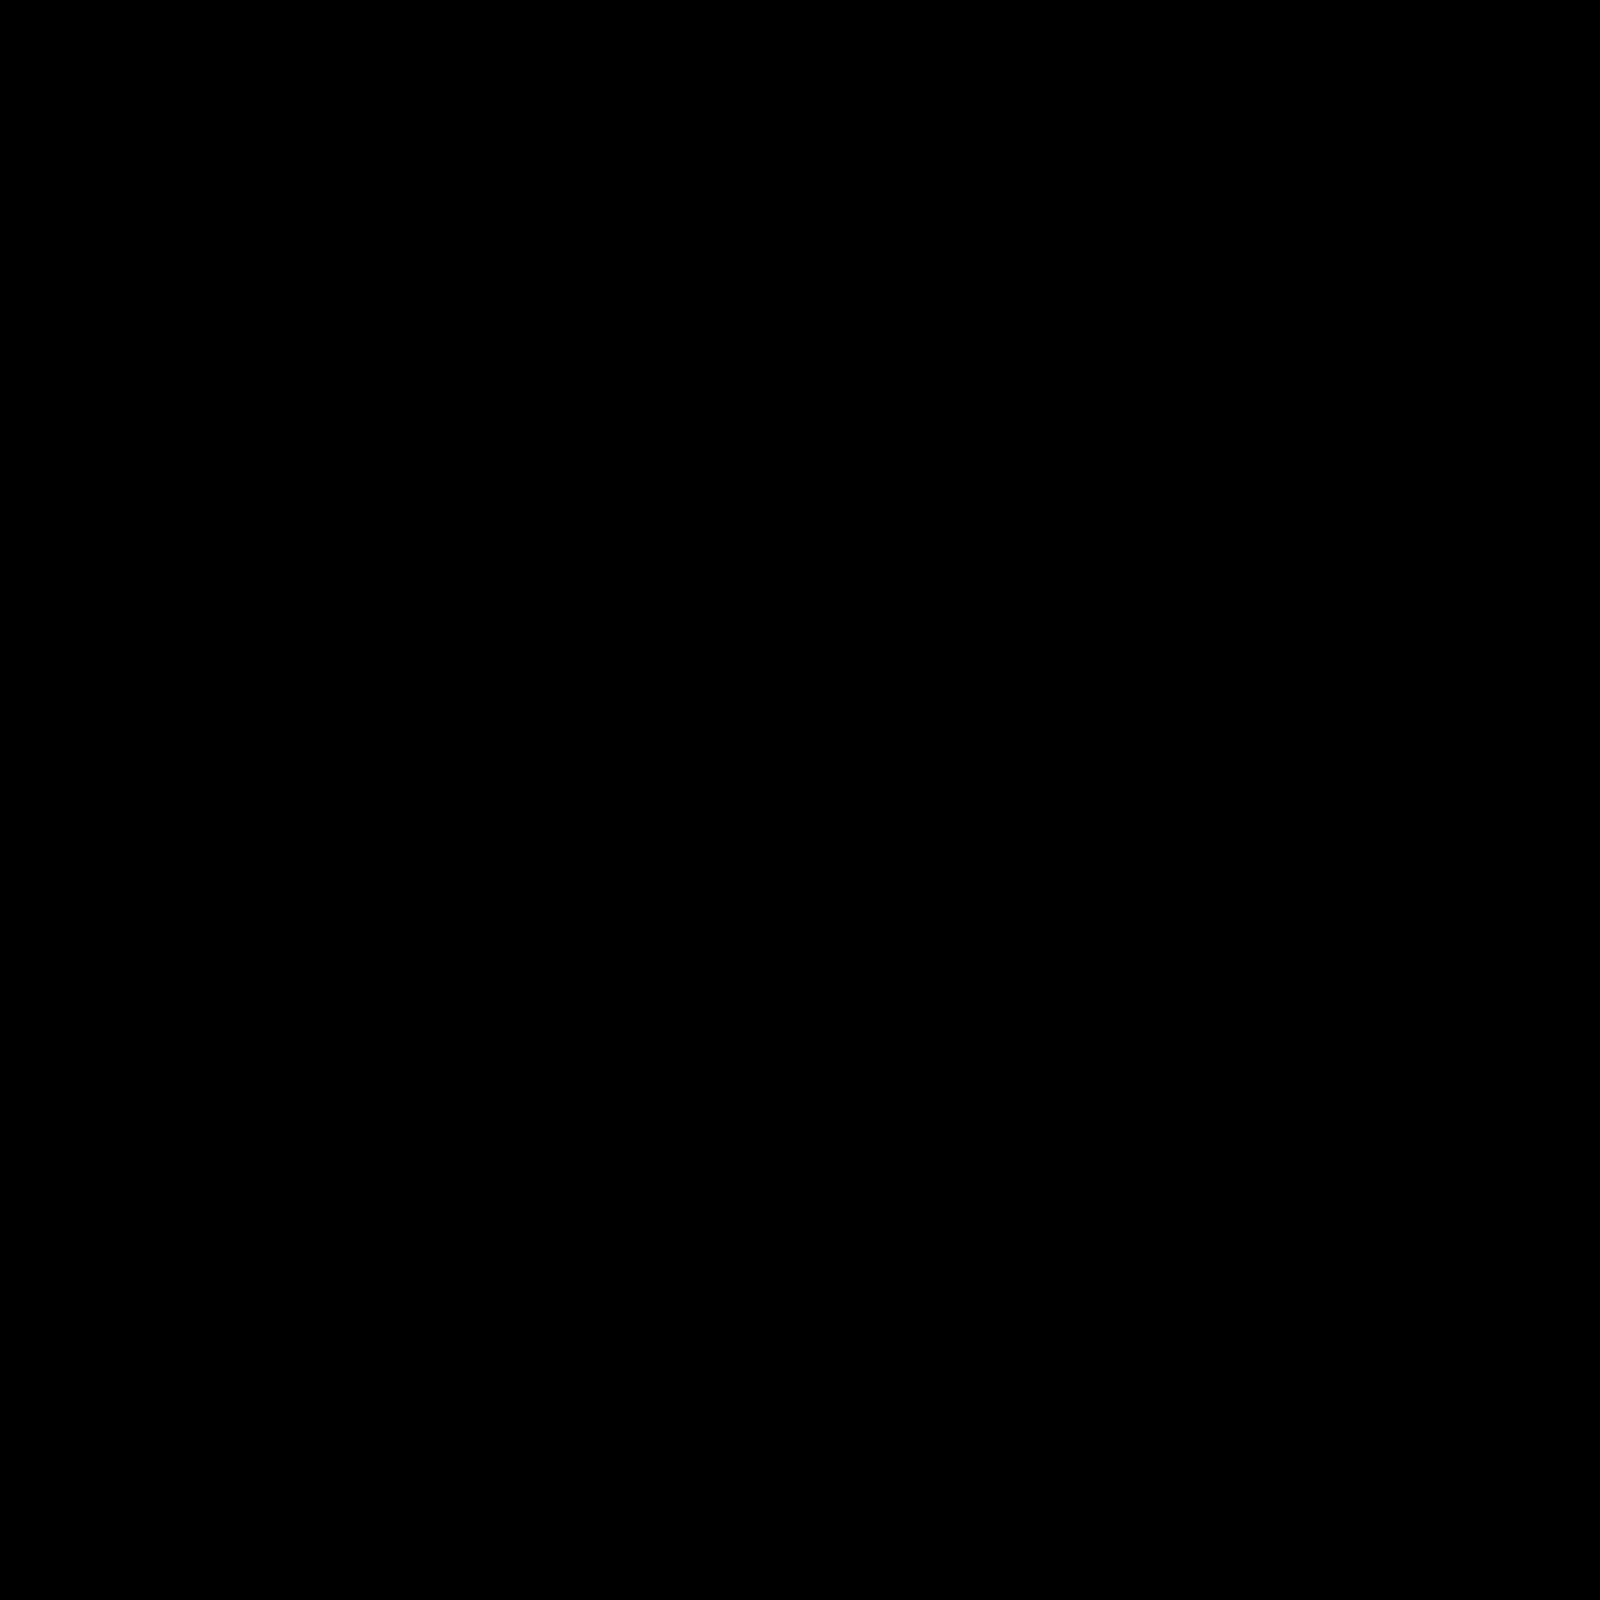 Cygaro icon